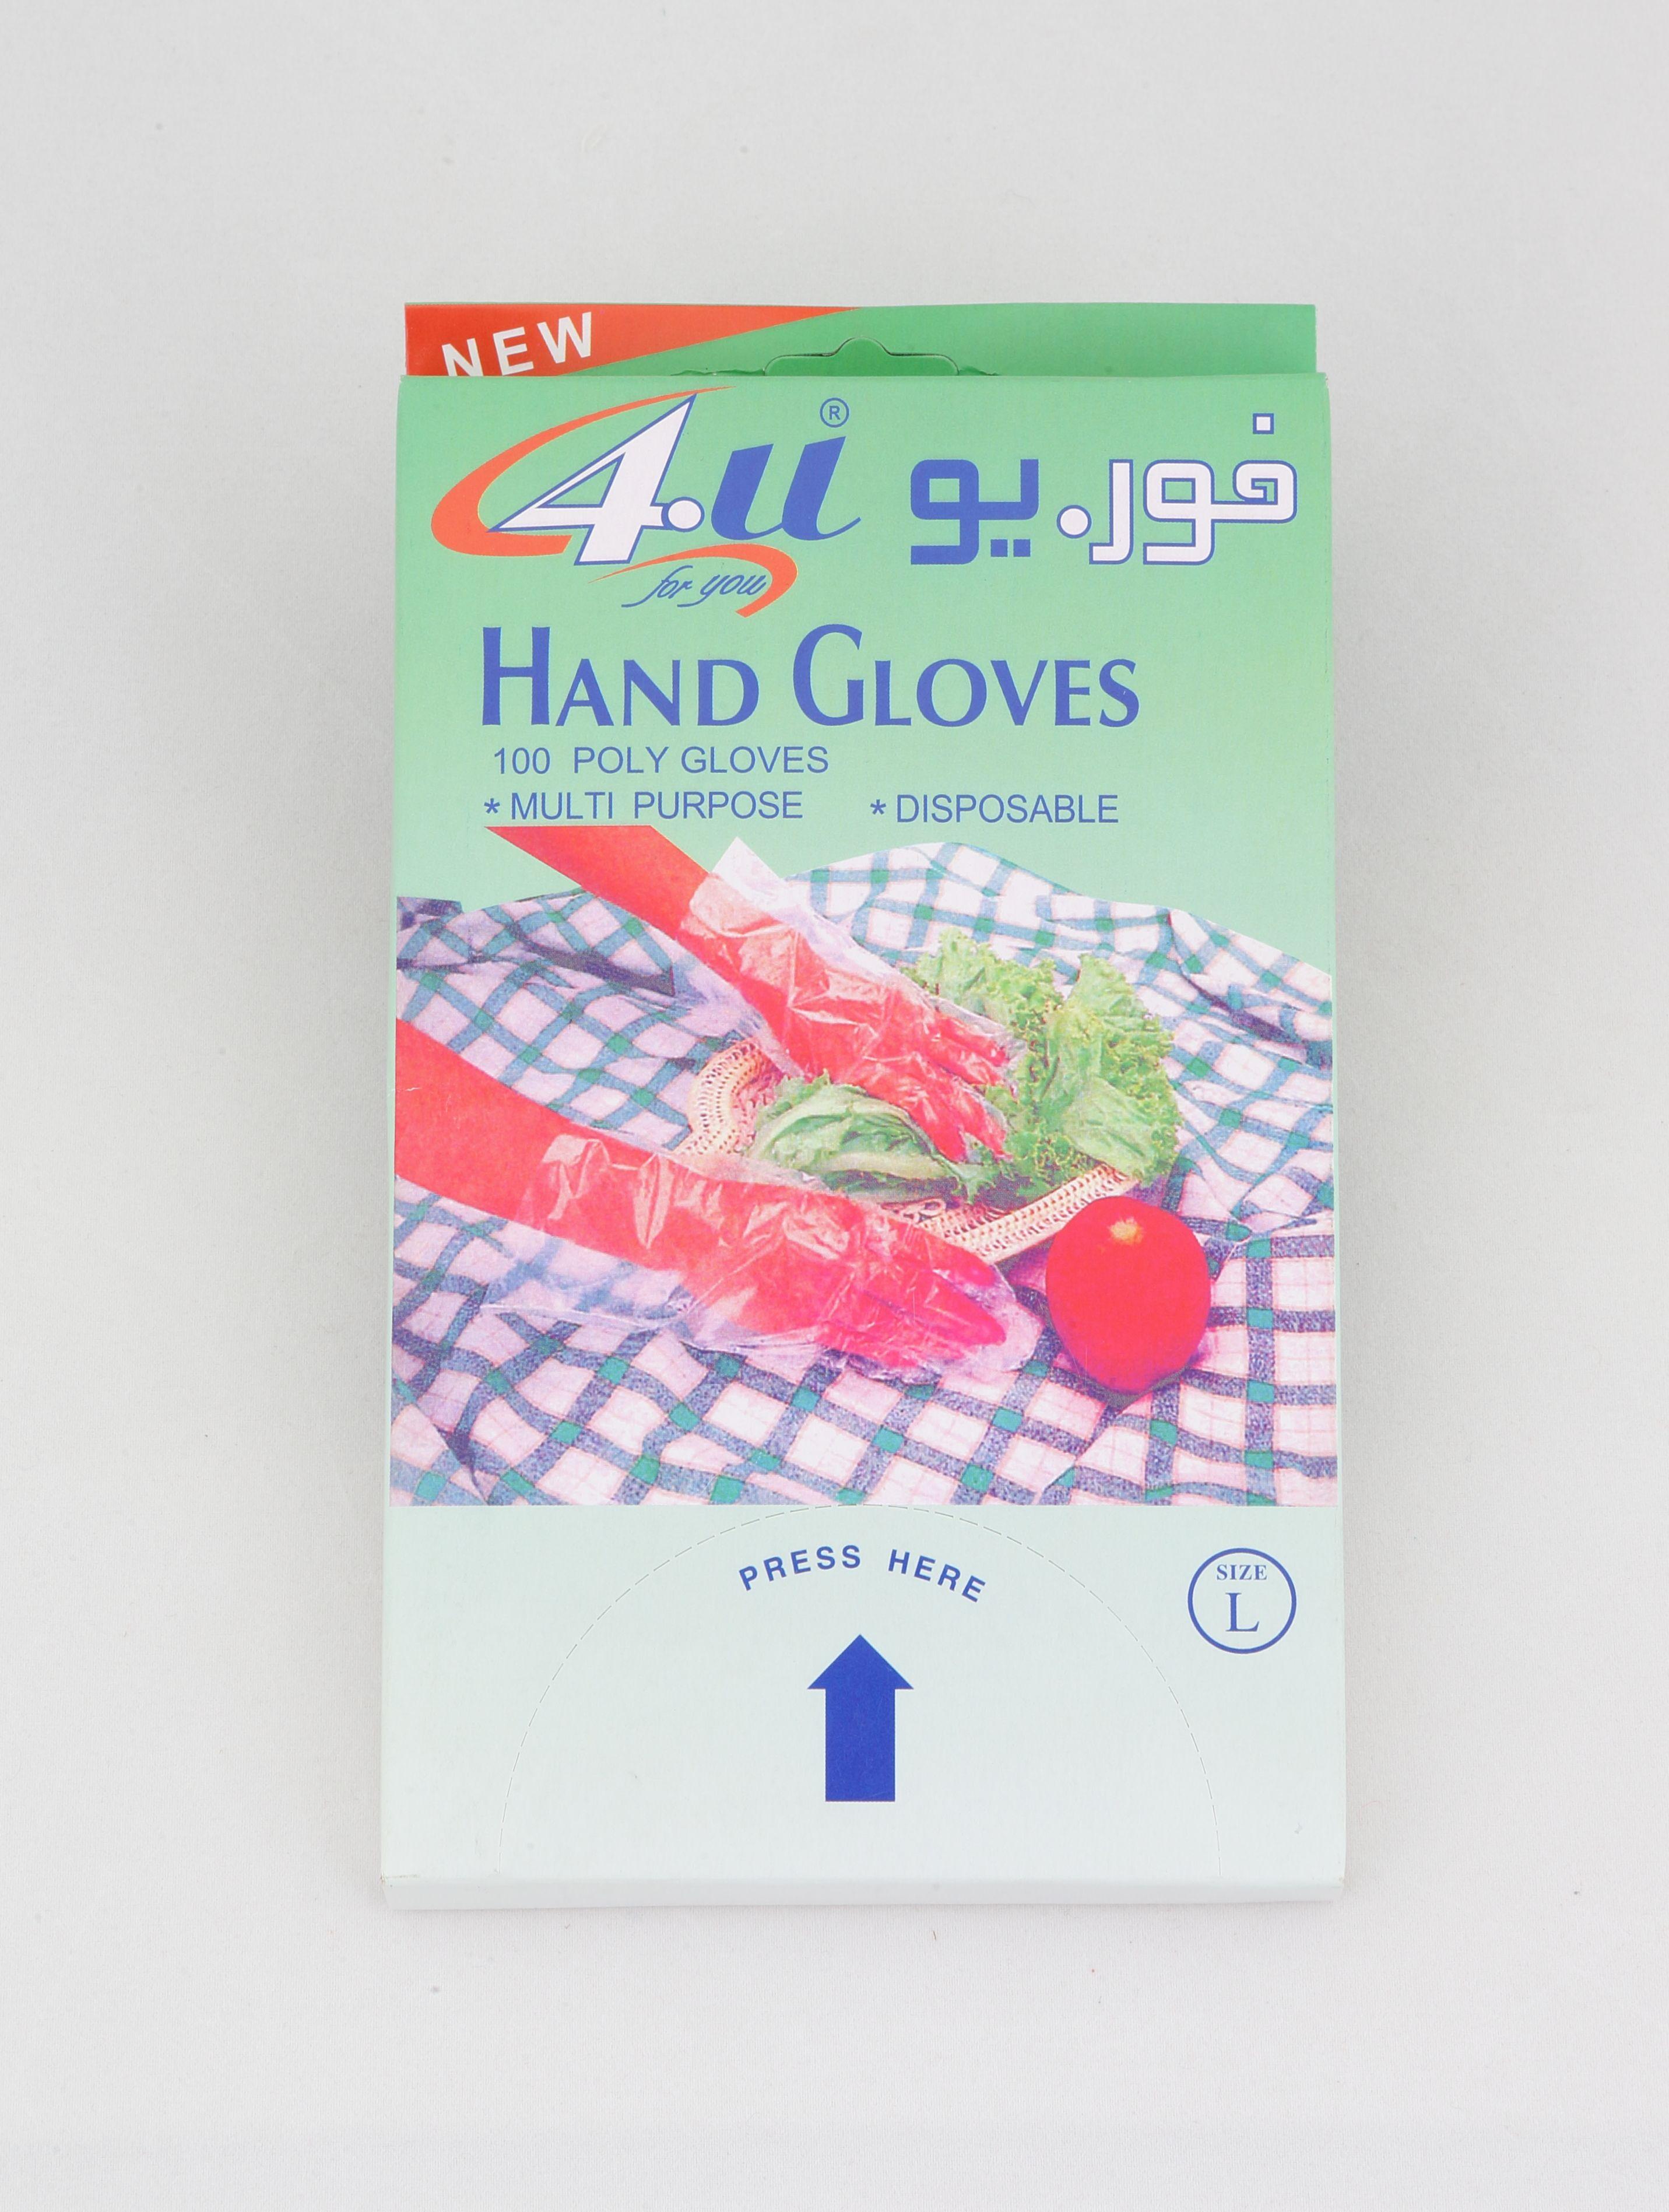 كفوف شفافة علبة كرتون تمه تمه لأجلك انت Hand Gloves Book Cover Cover